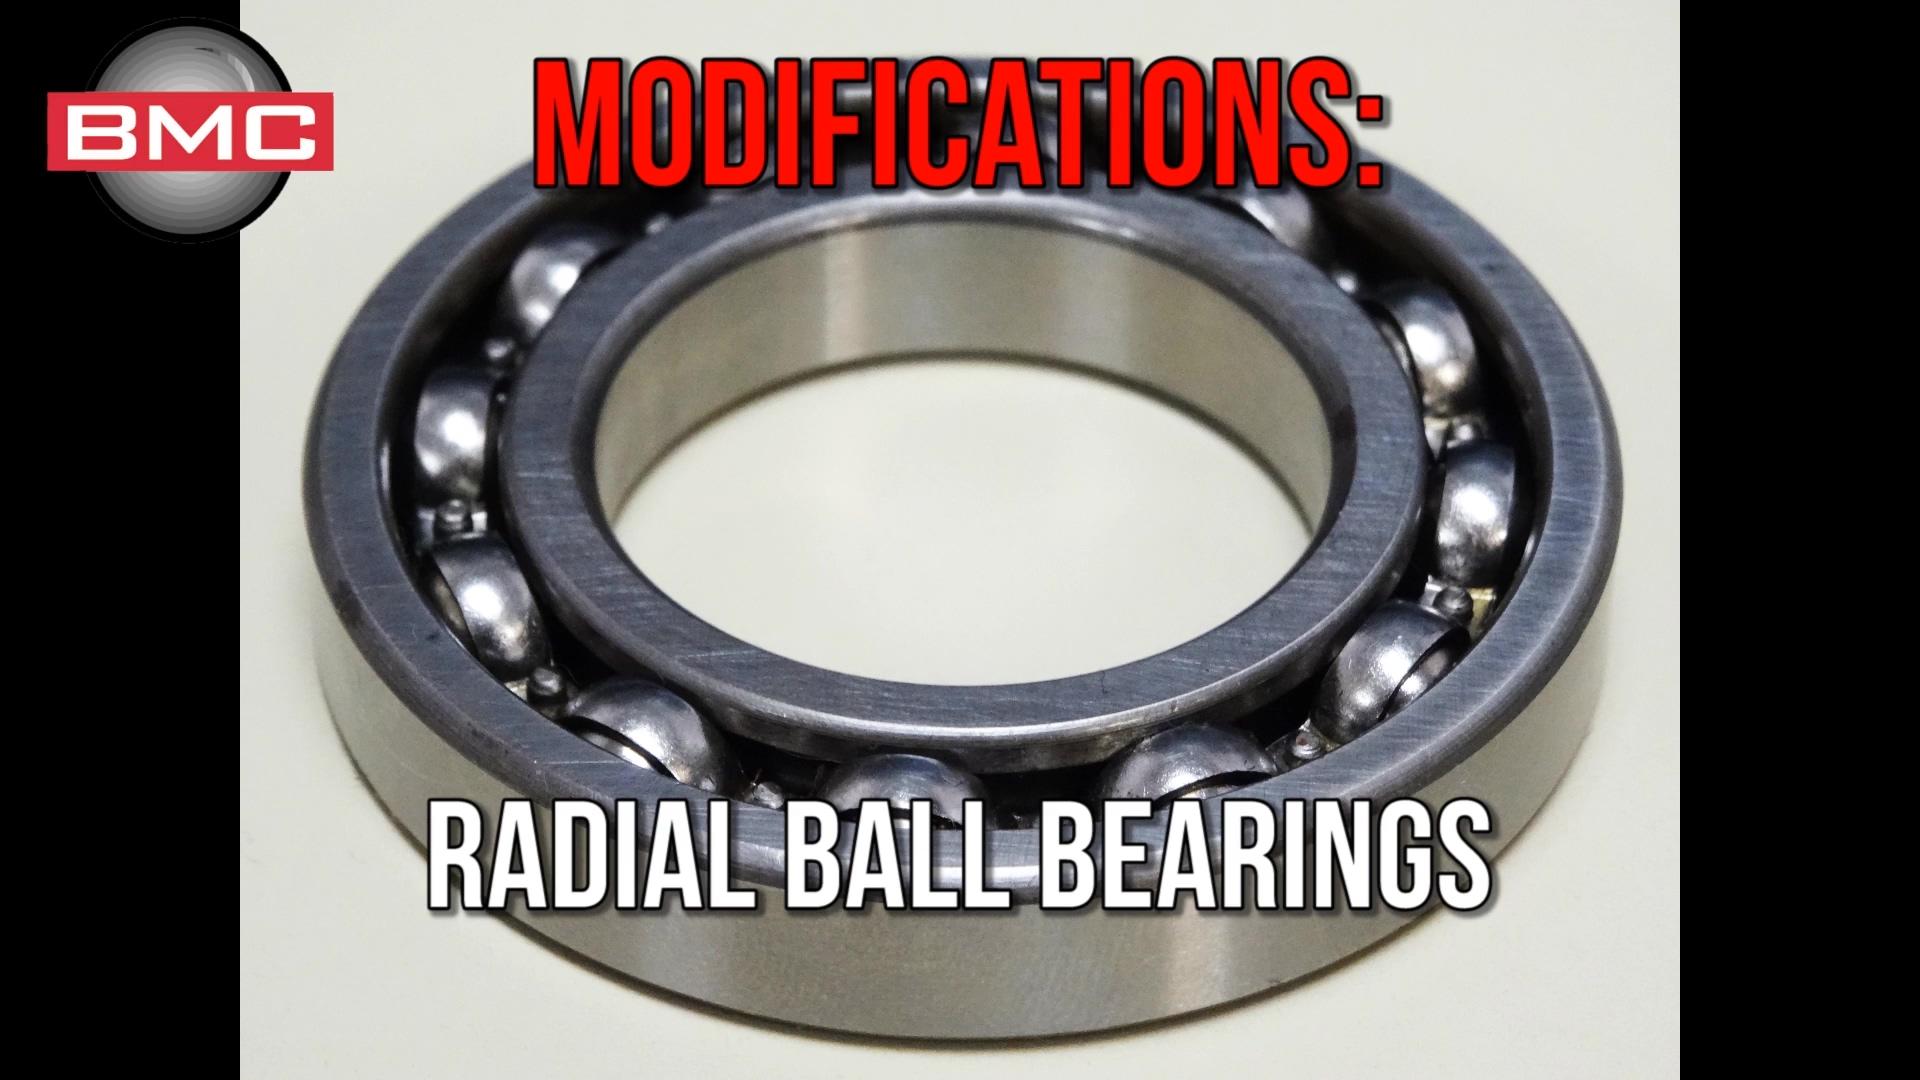 BMC Video - Radials